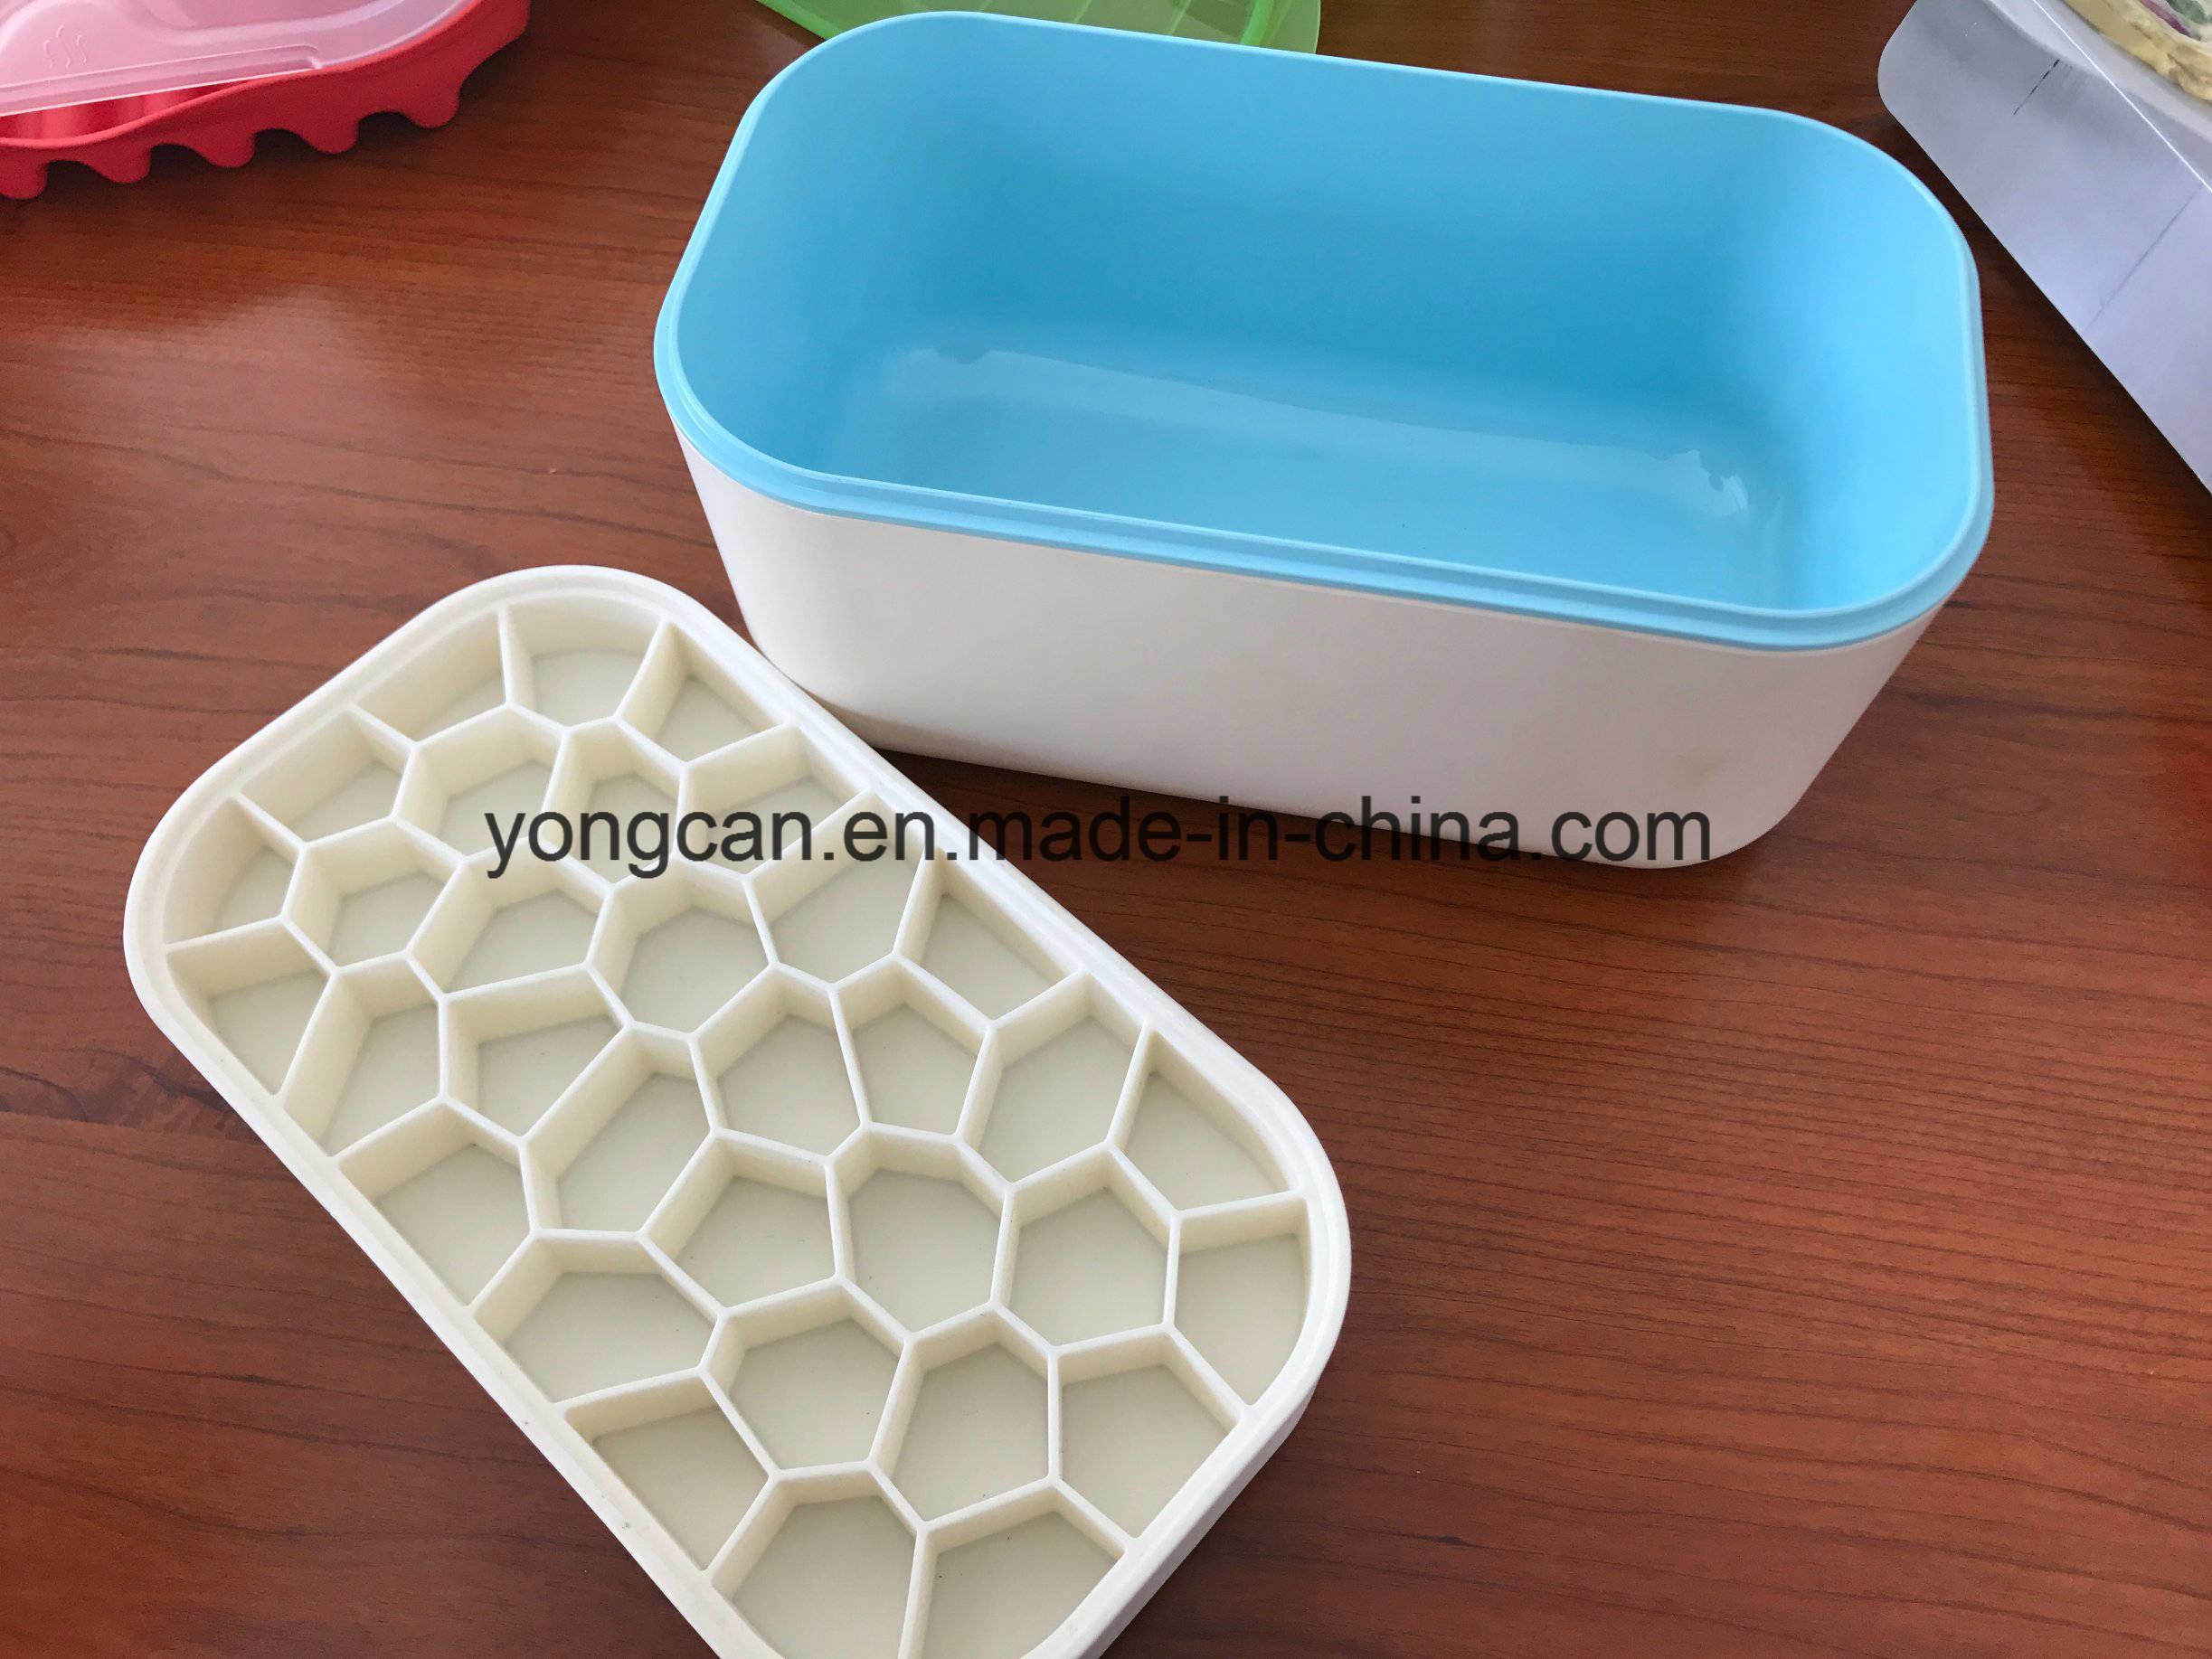 OEM Homemade Ice Cream Box/ Plastic Ice Box/ Silicone Rubber Mold Cooler Box